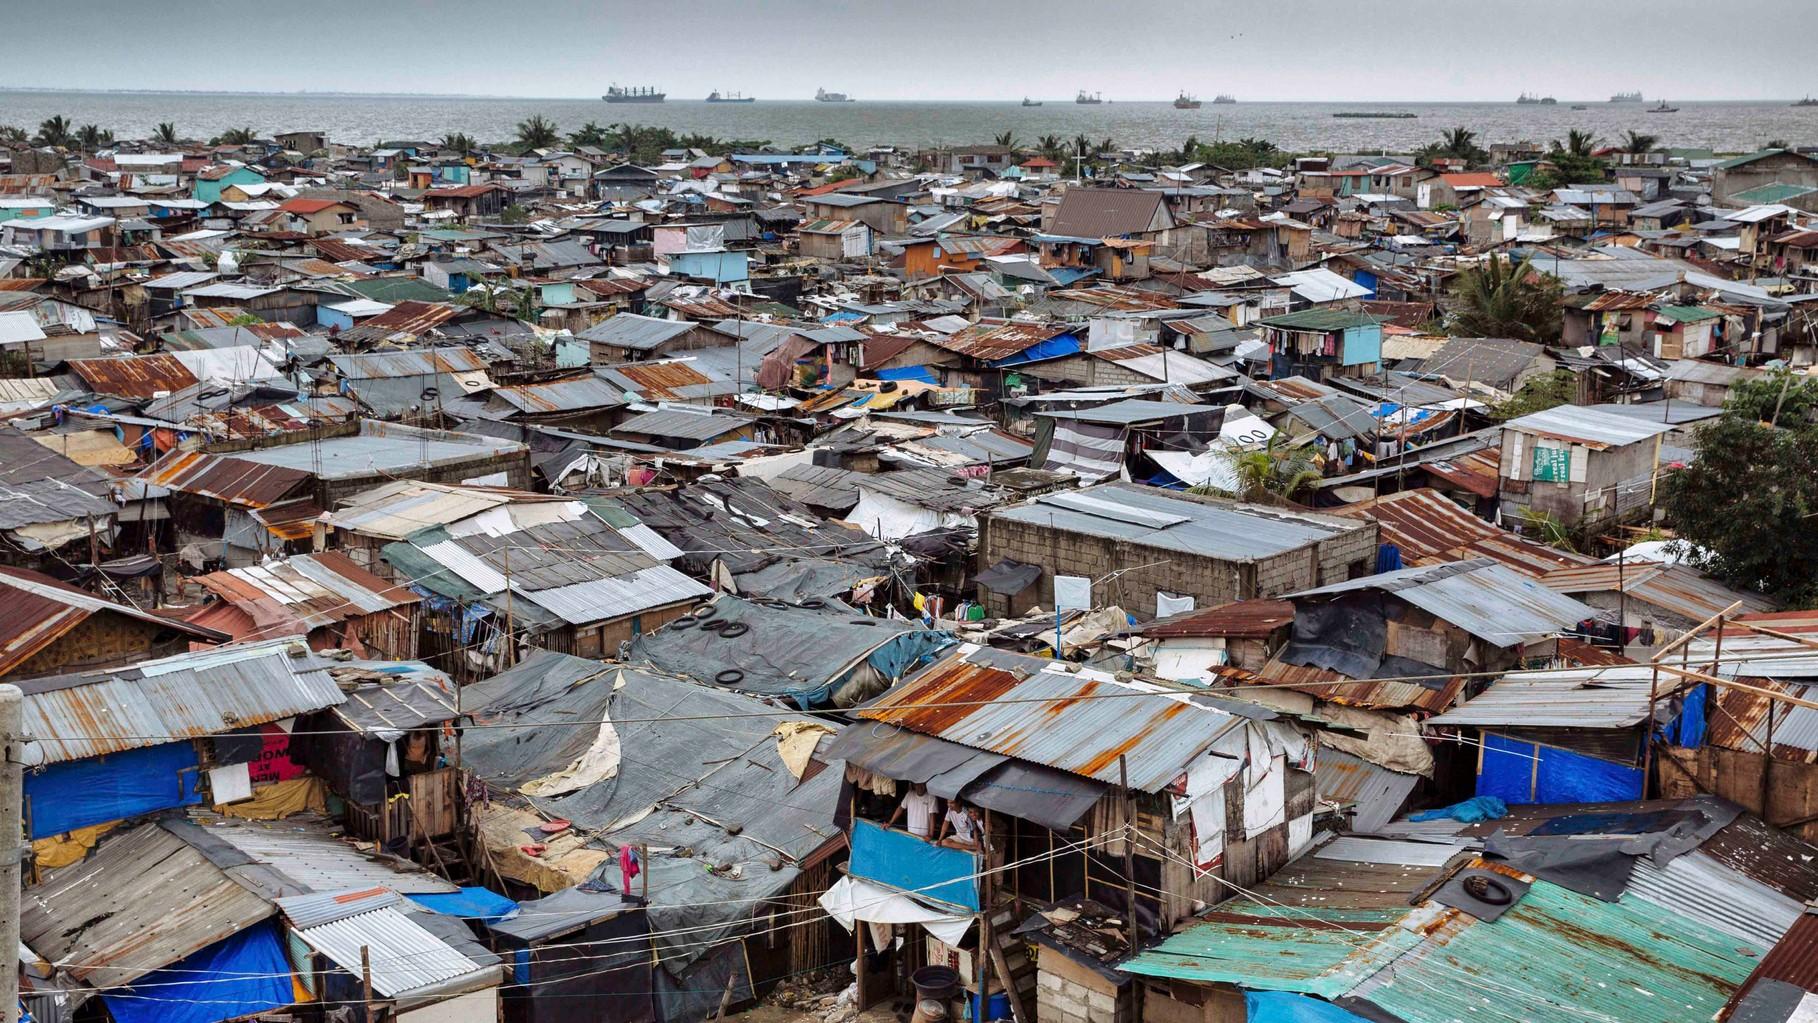 One Million live  in Danger Zones near the sea